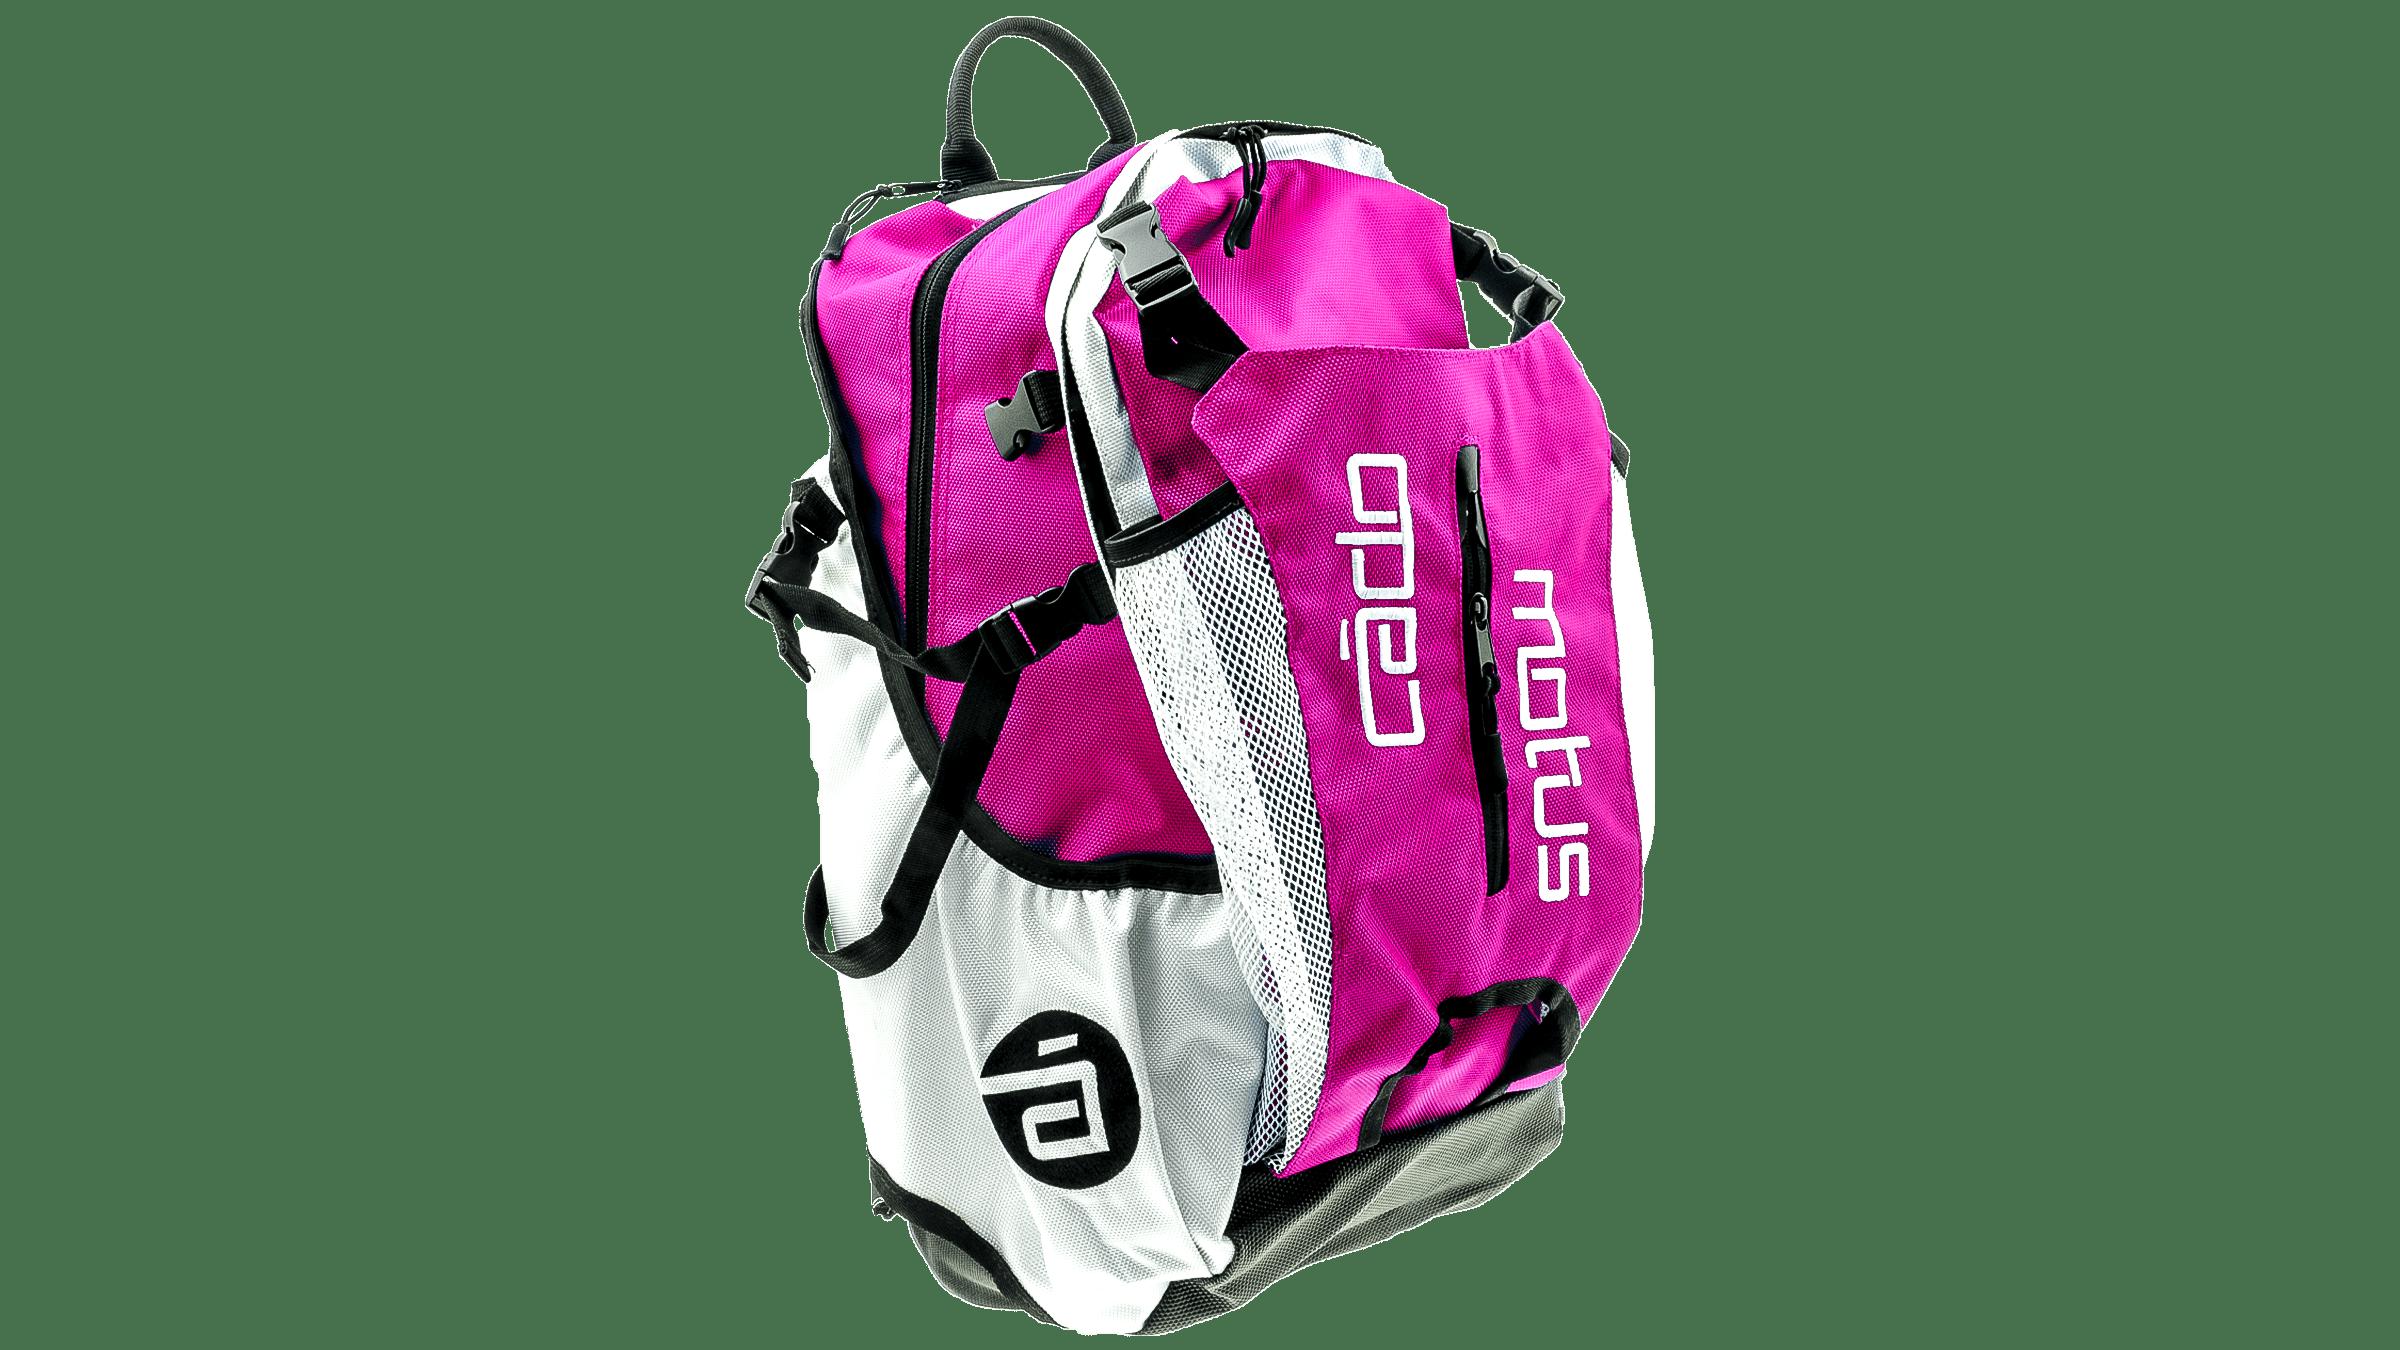 10d98c255a3 CadoMotus Airflow gear skate skeeler bag - pink/white bestellen bij ...